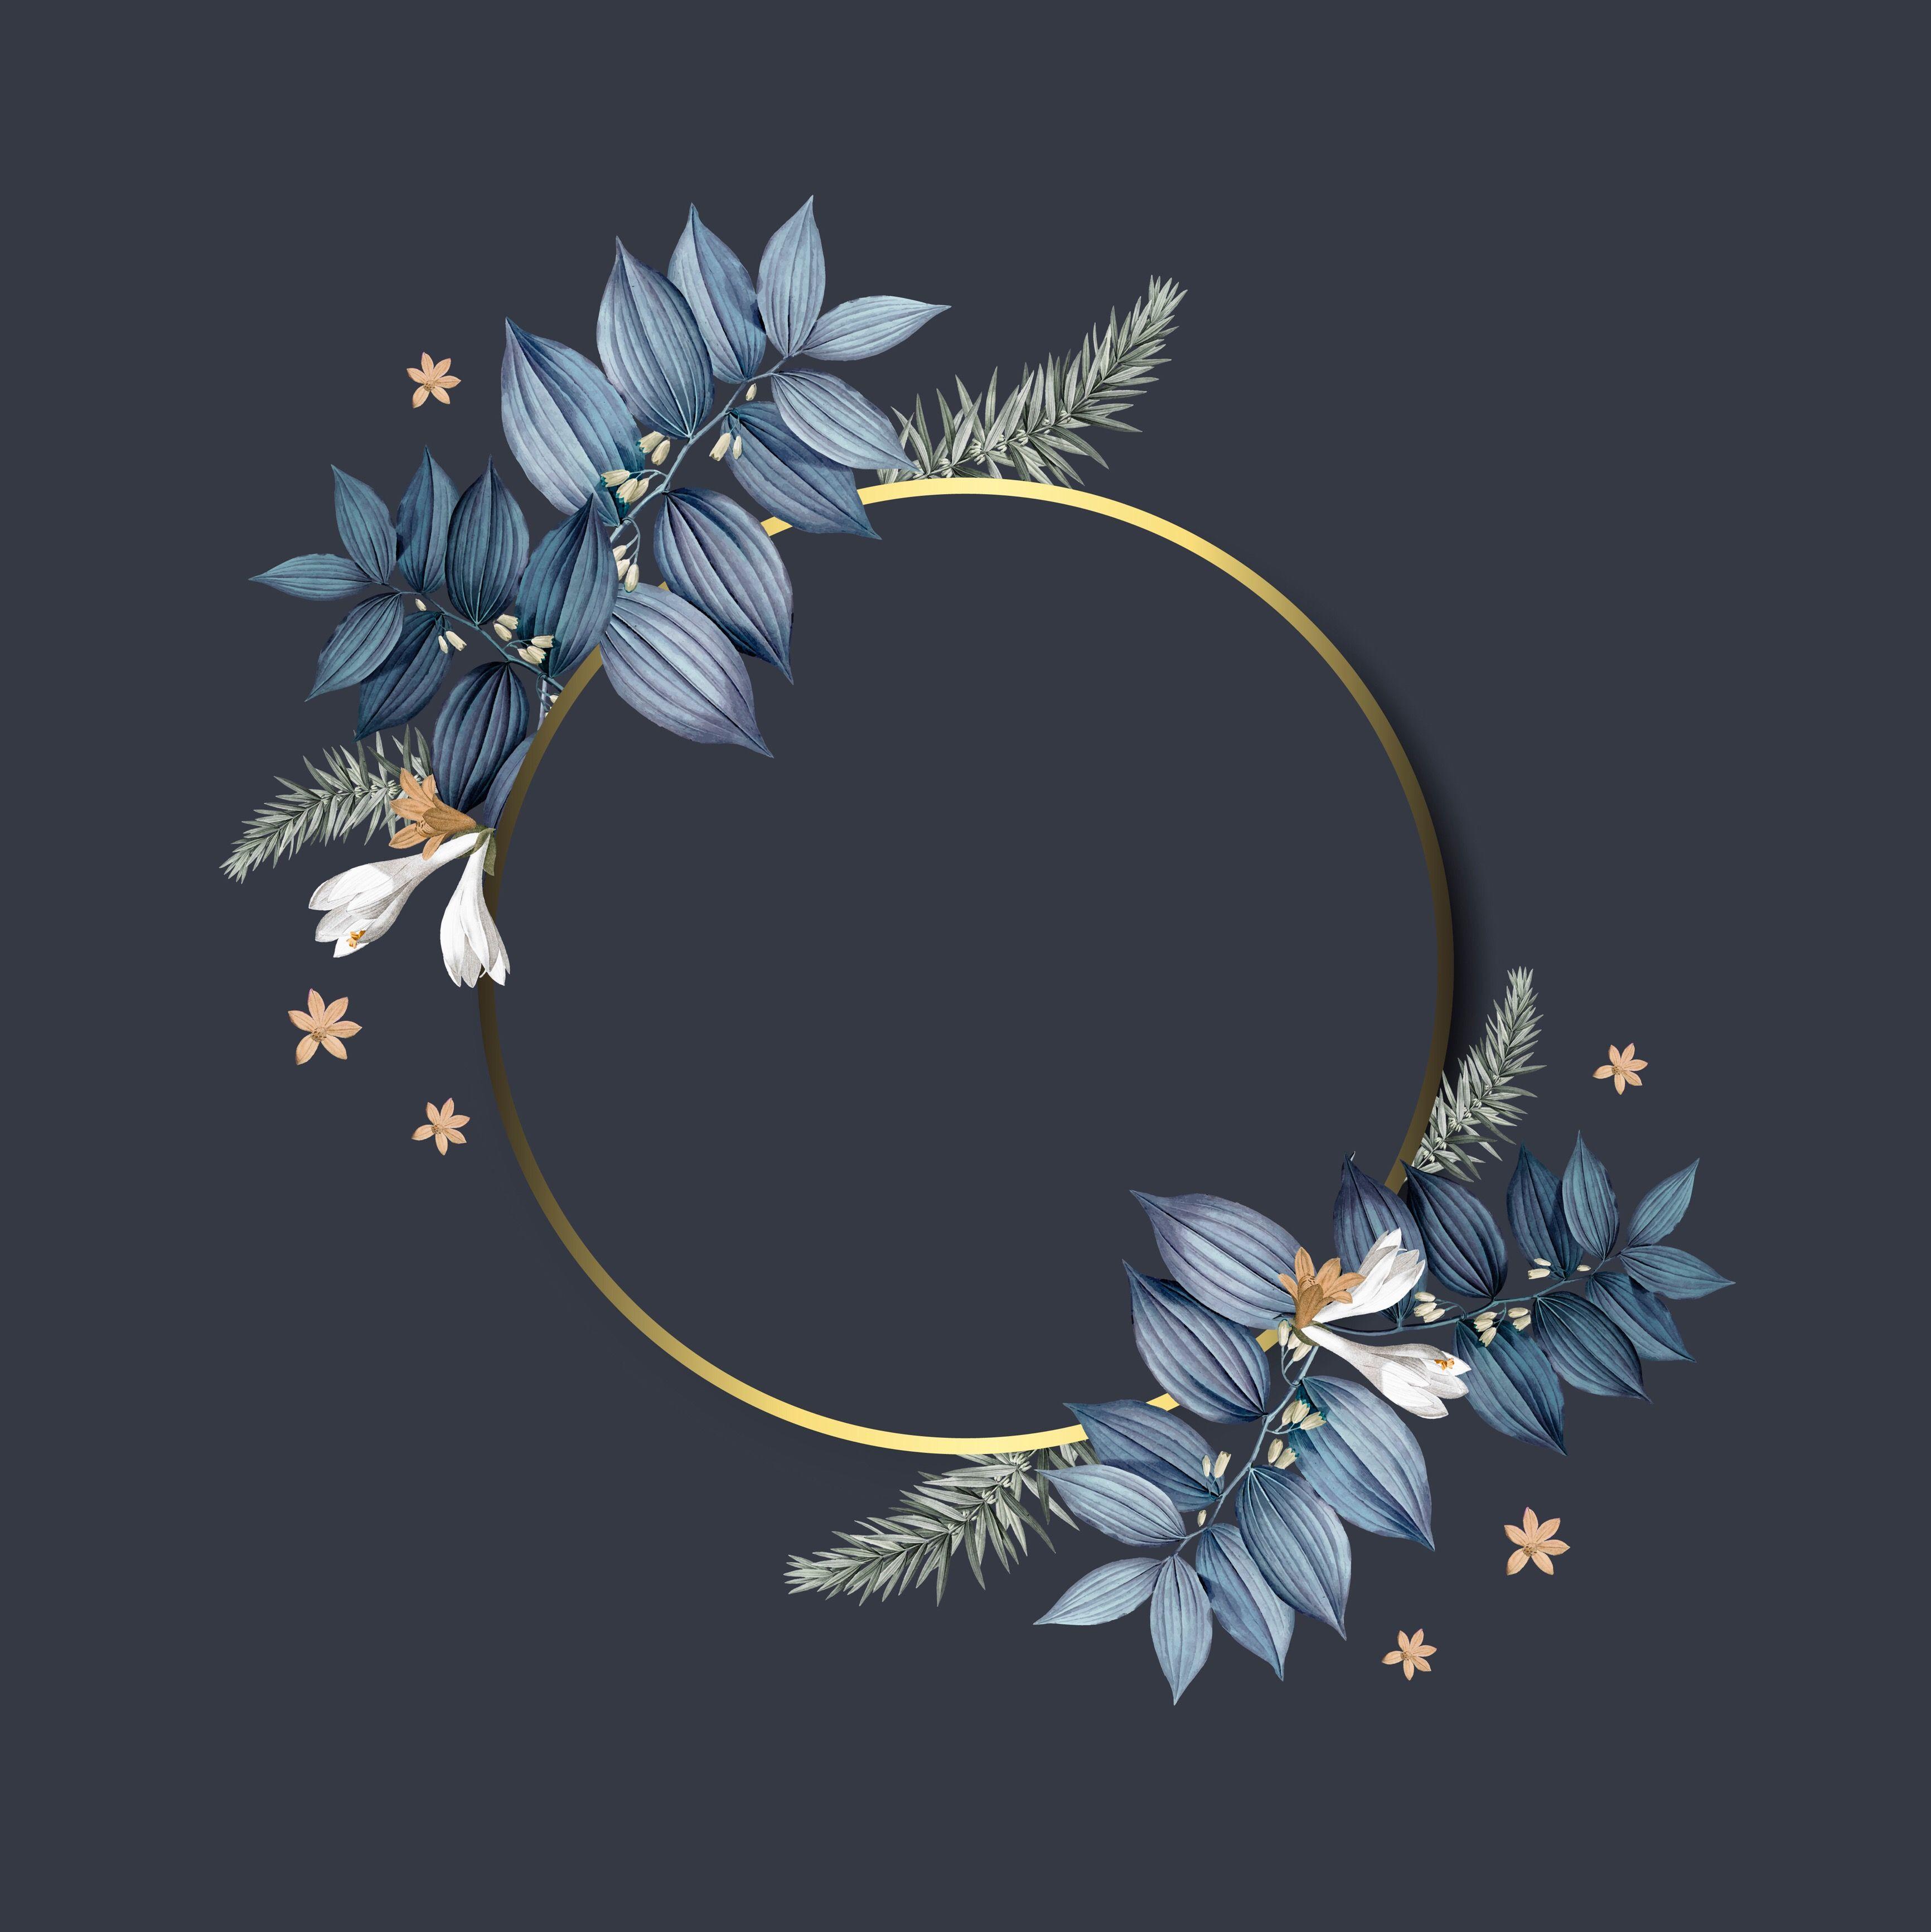 Freetoedit ثيم ازرق برواز ورد ورق كحلي ولد مولود Remixit Frame Design Flower Frame Floral